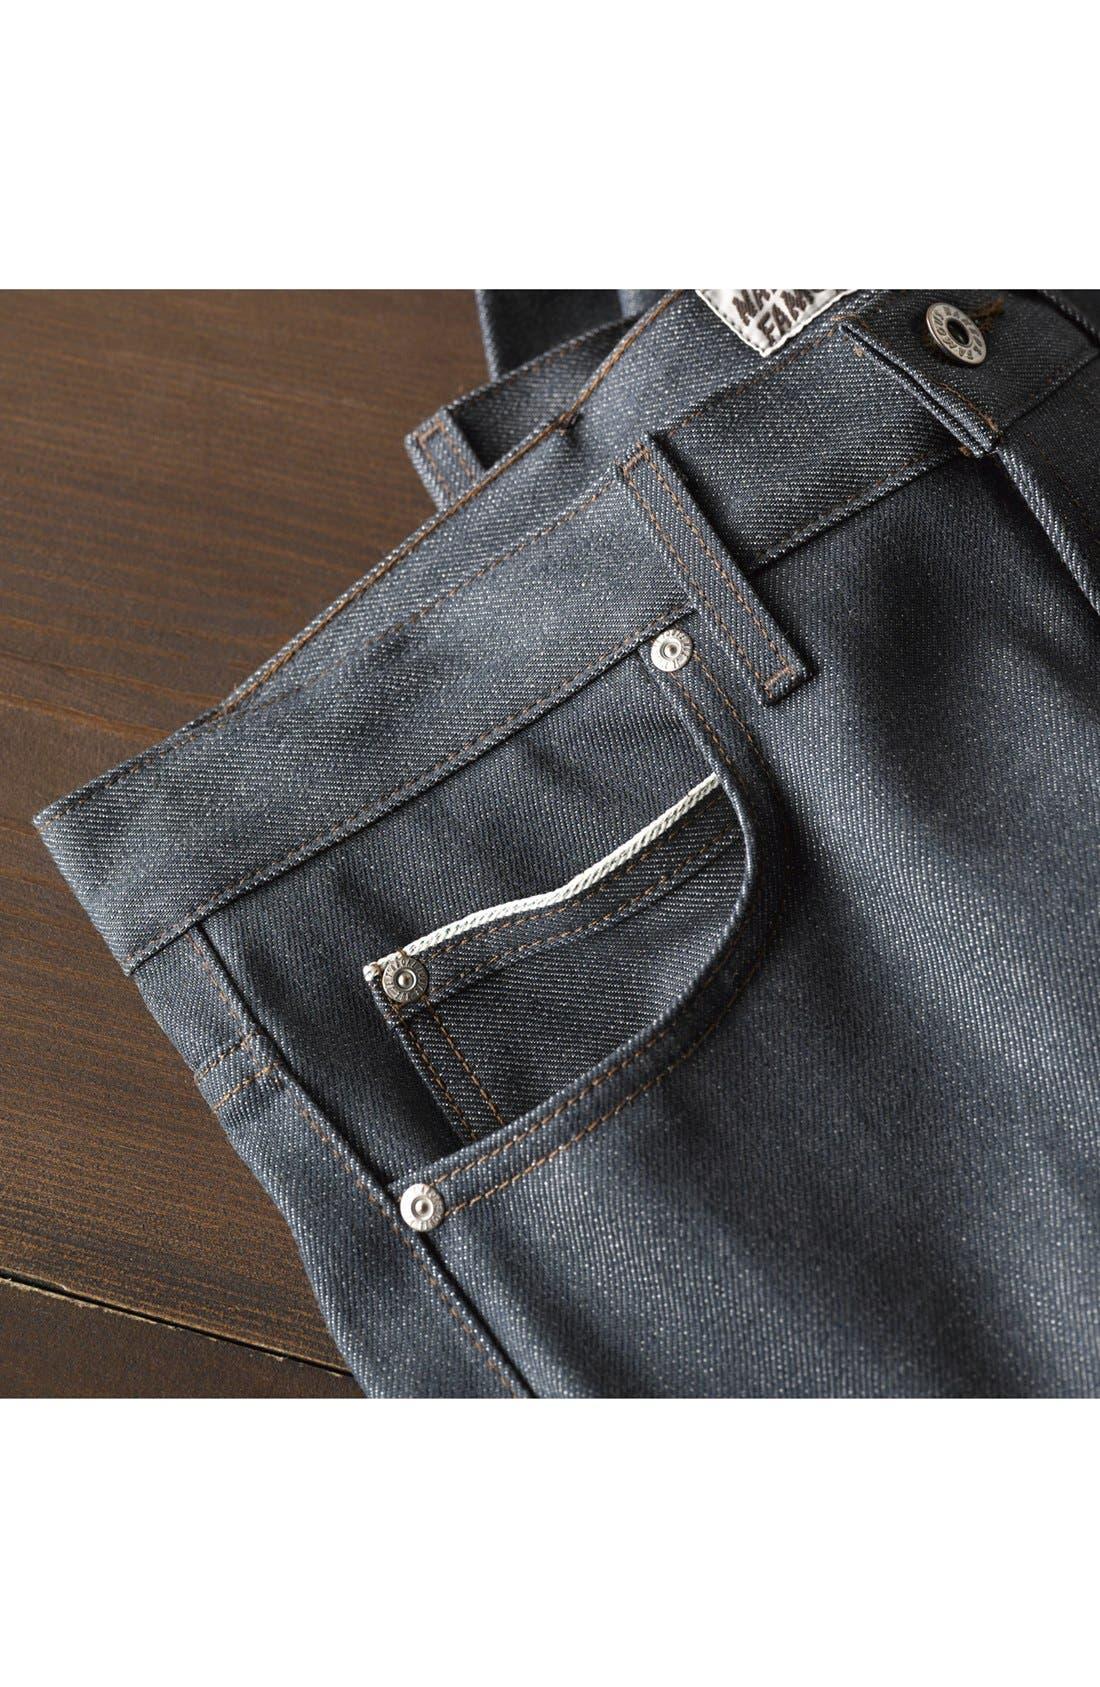 Alternate Image 5  - Naked & Famous Denim 'Skinny Guy' Skinny Fit Selvedge Jeans